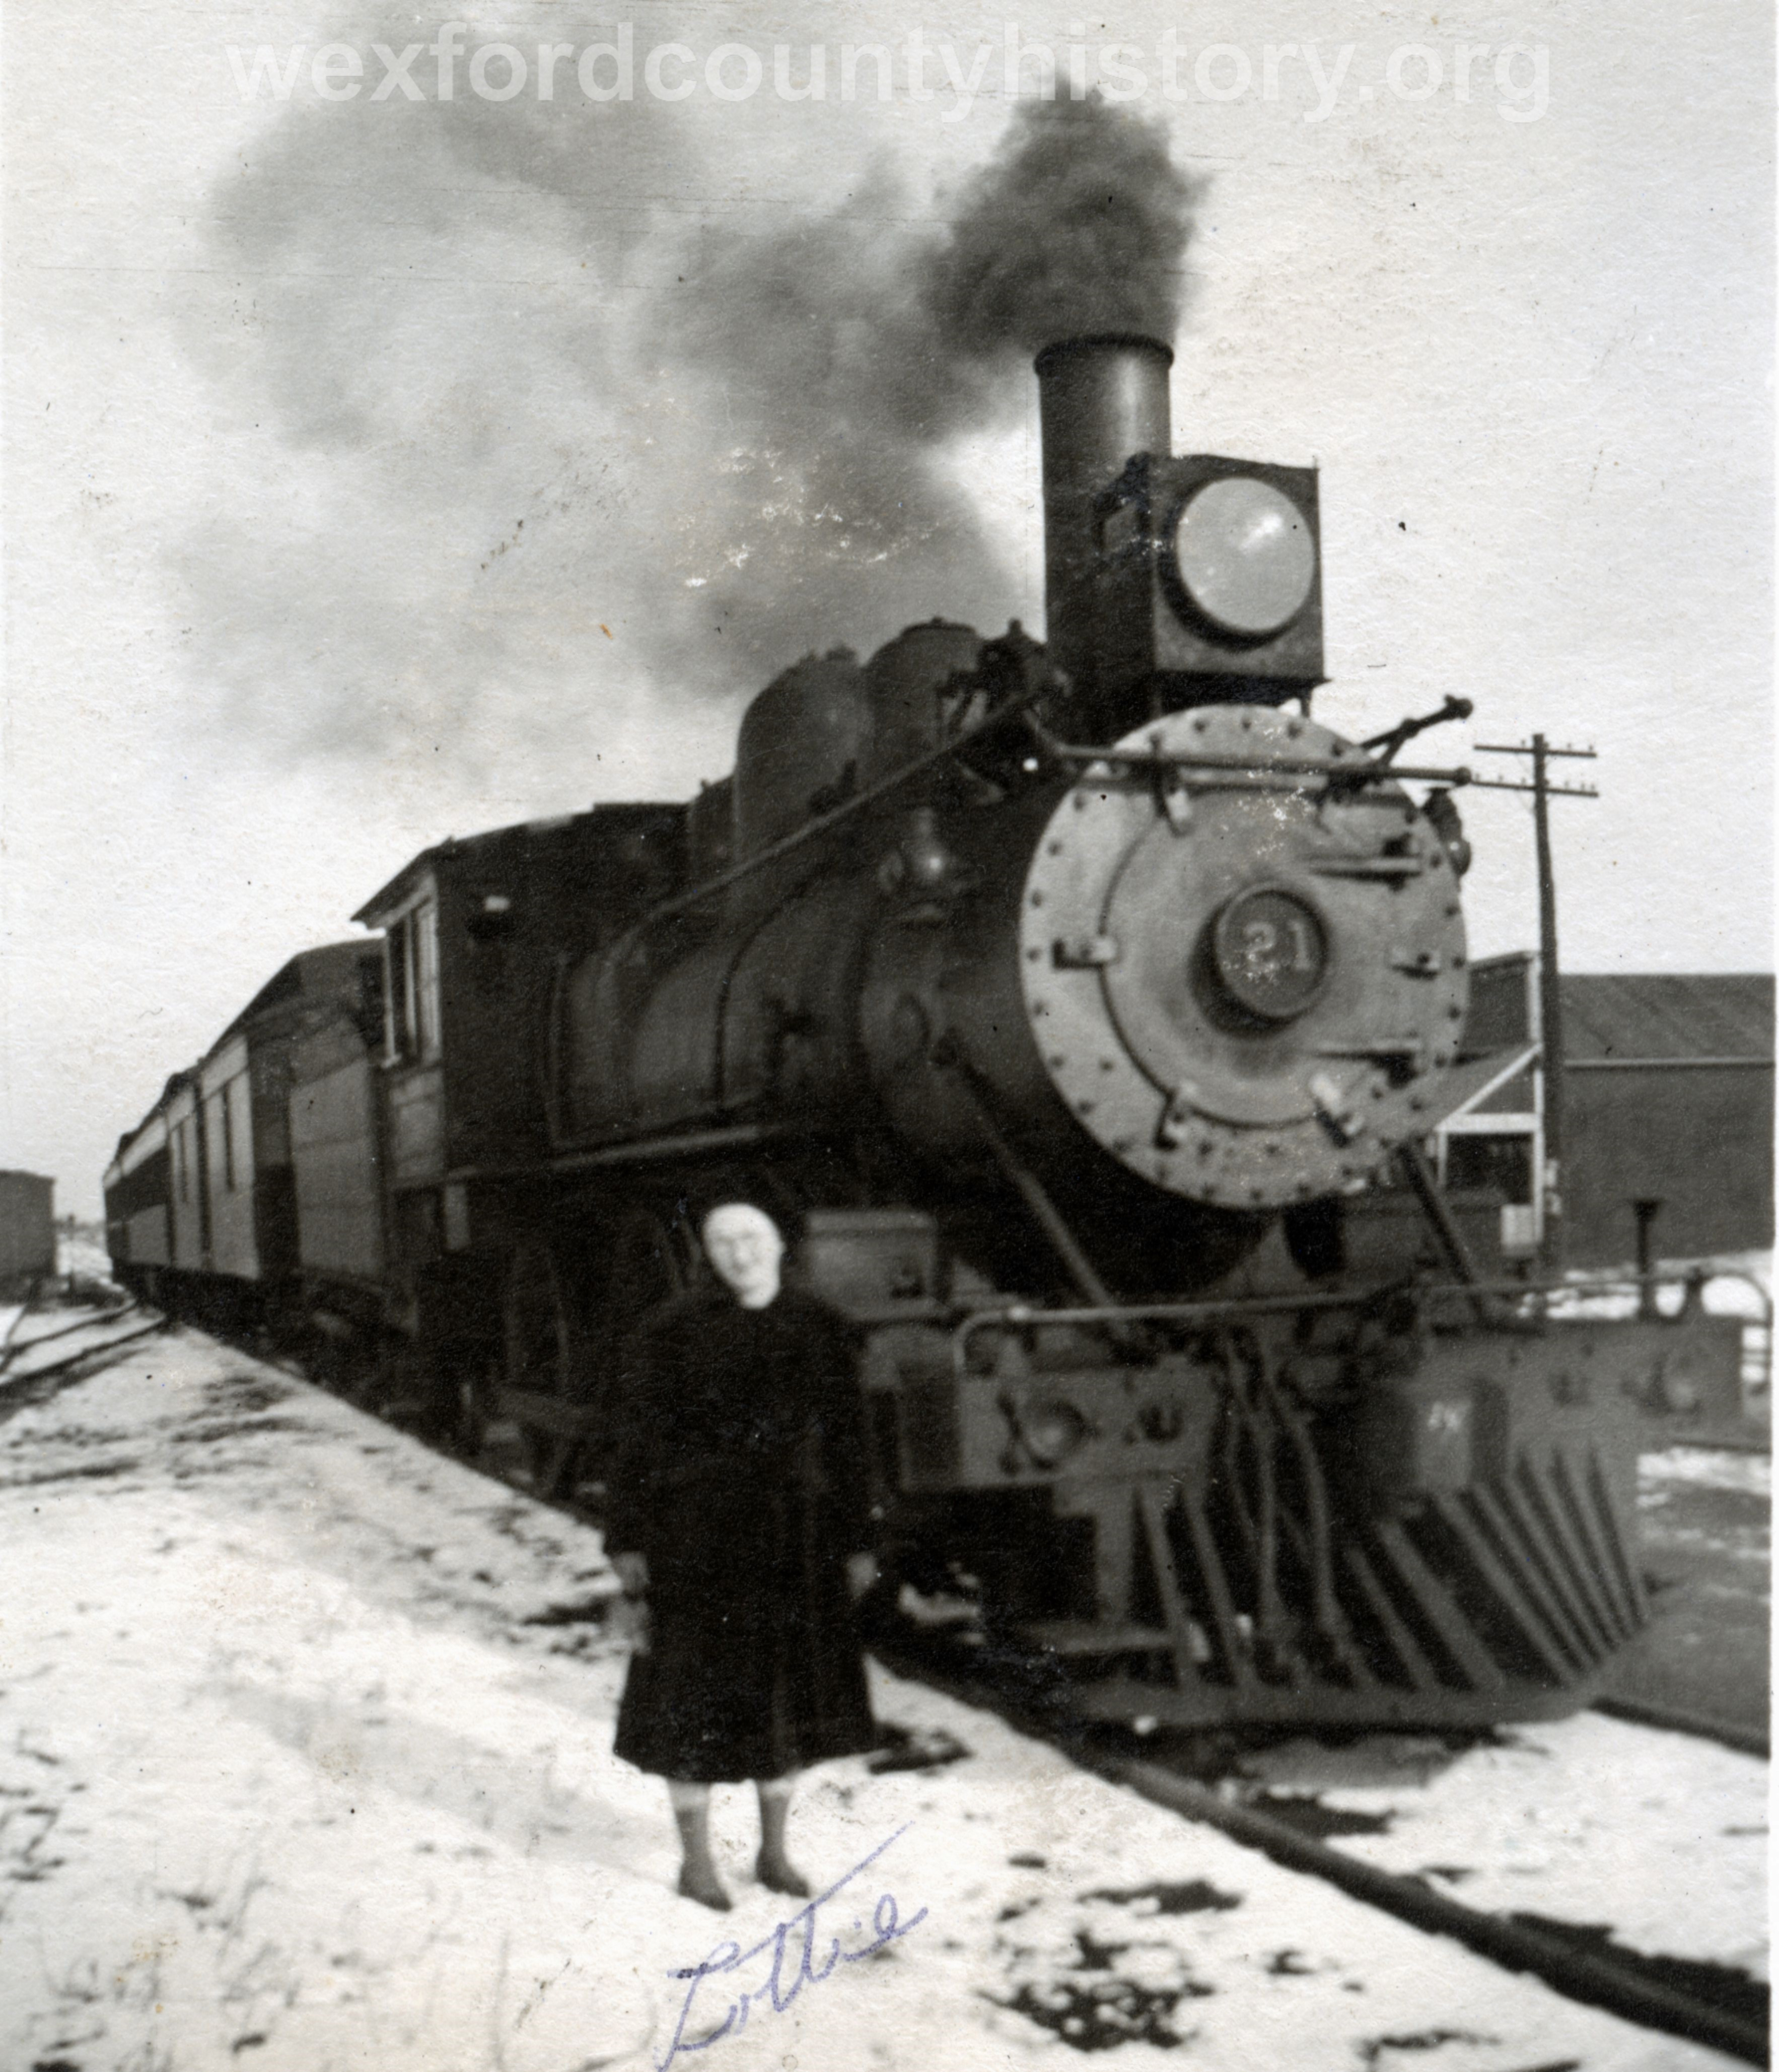 Cadillac-Railroad-Loco-21-GRIRR-Walton-jct-Wexford-mus